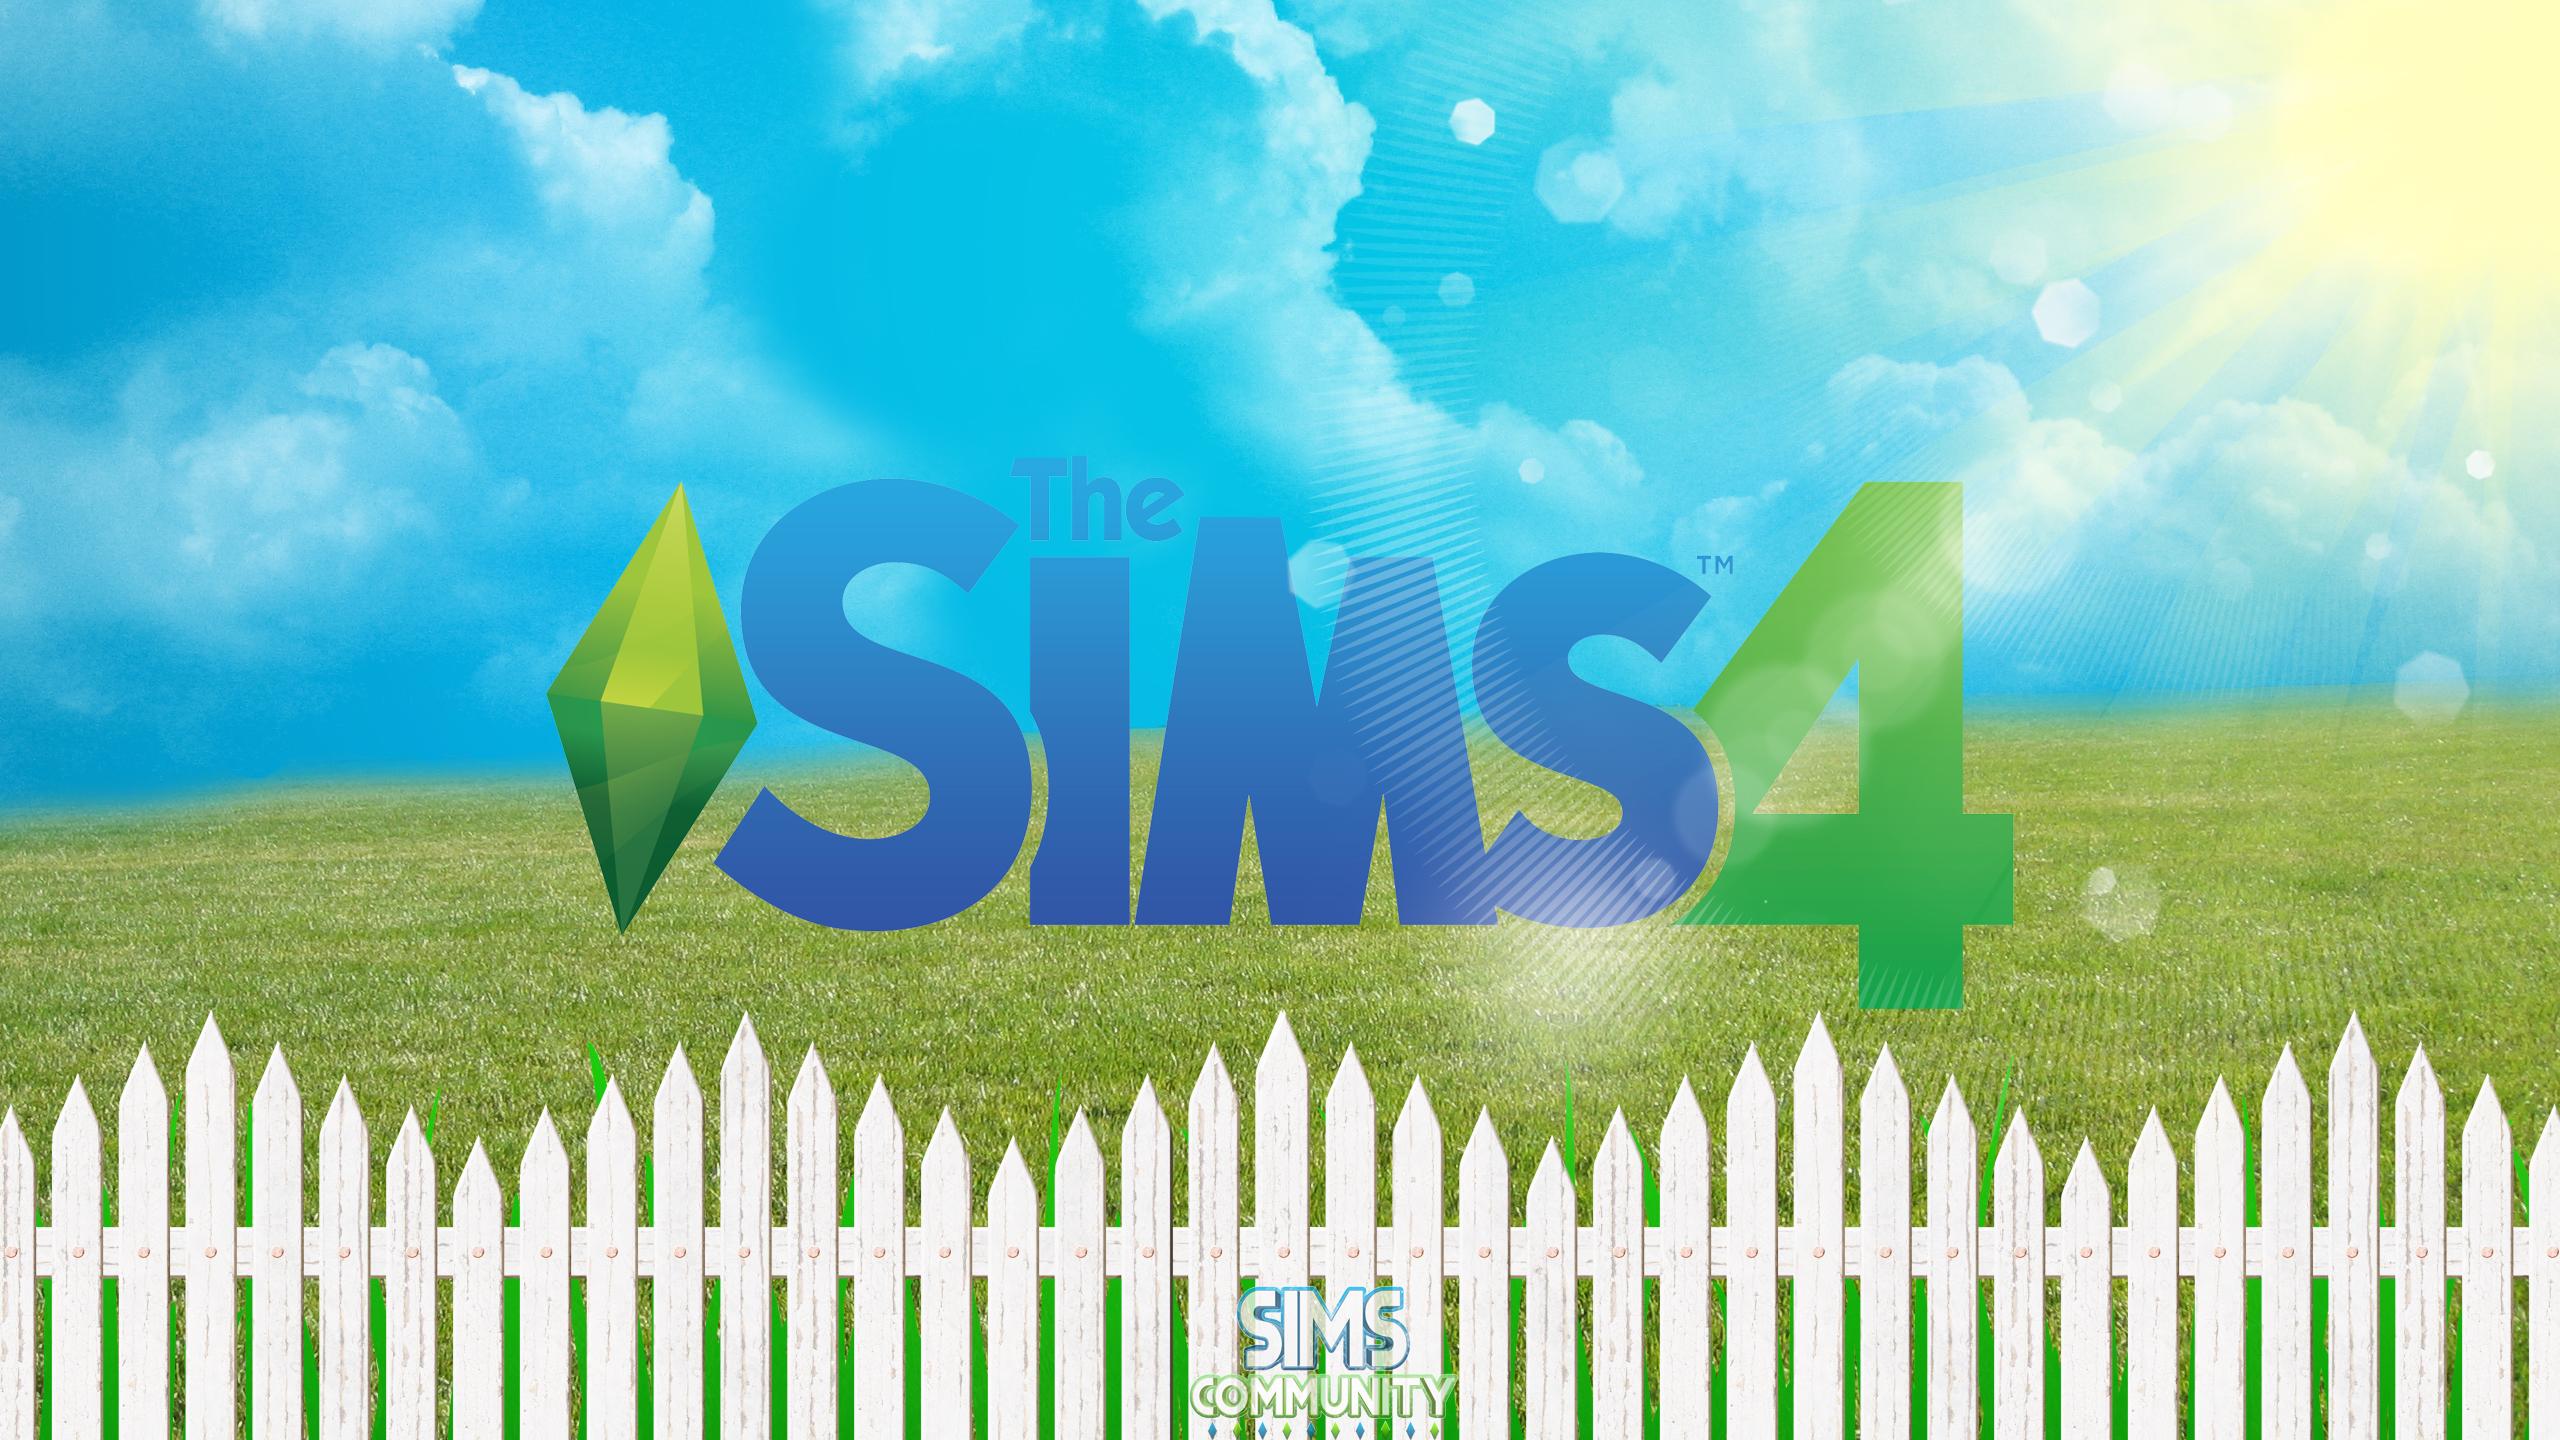 [50+] Sims 4 Wallpapers on WallpaperSafari